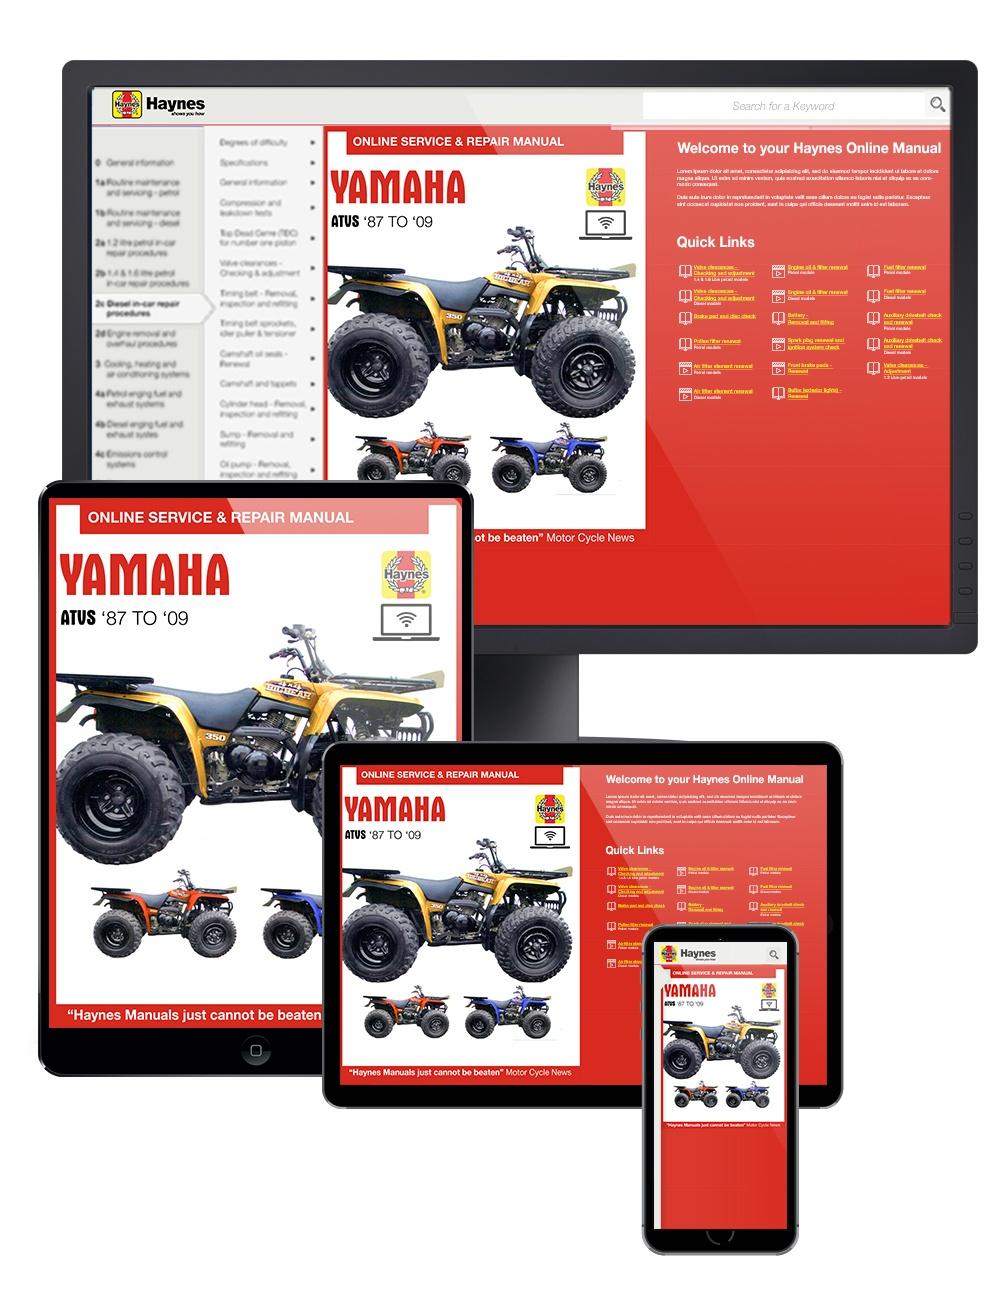 Yamaha YFB and YFM ATVs Haynes Online Manual covering Timberwolf, Bear Tracker, Bruin, and Big Bear (87-09)